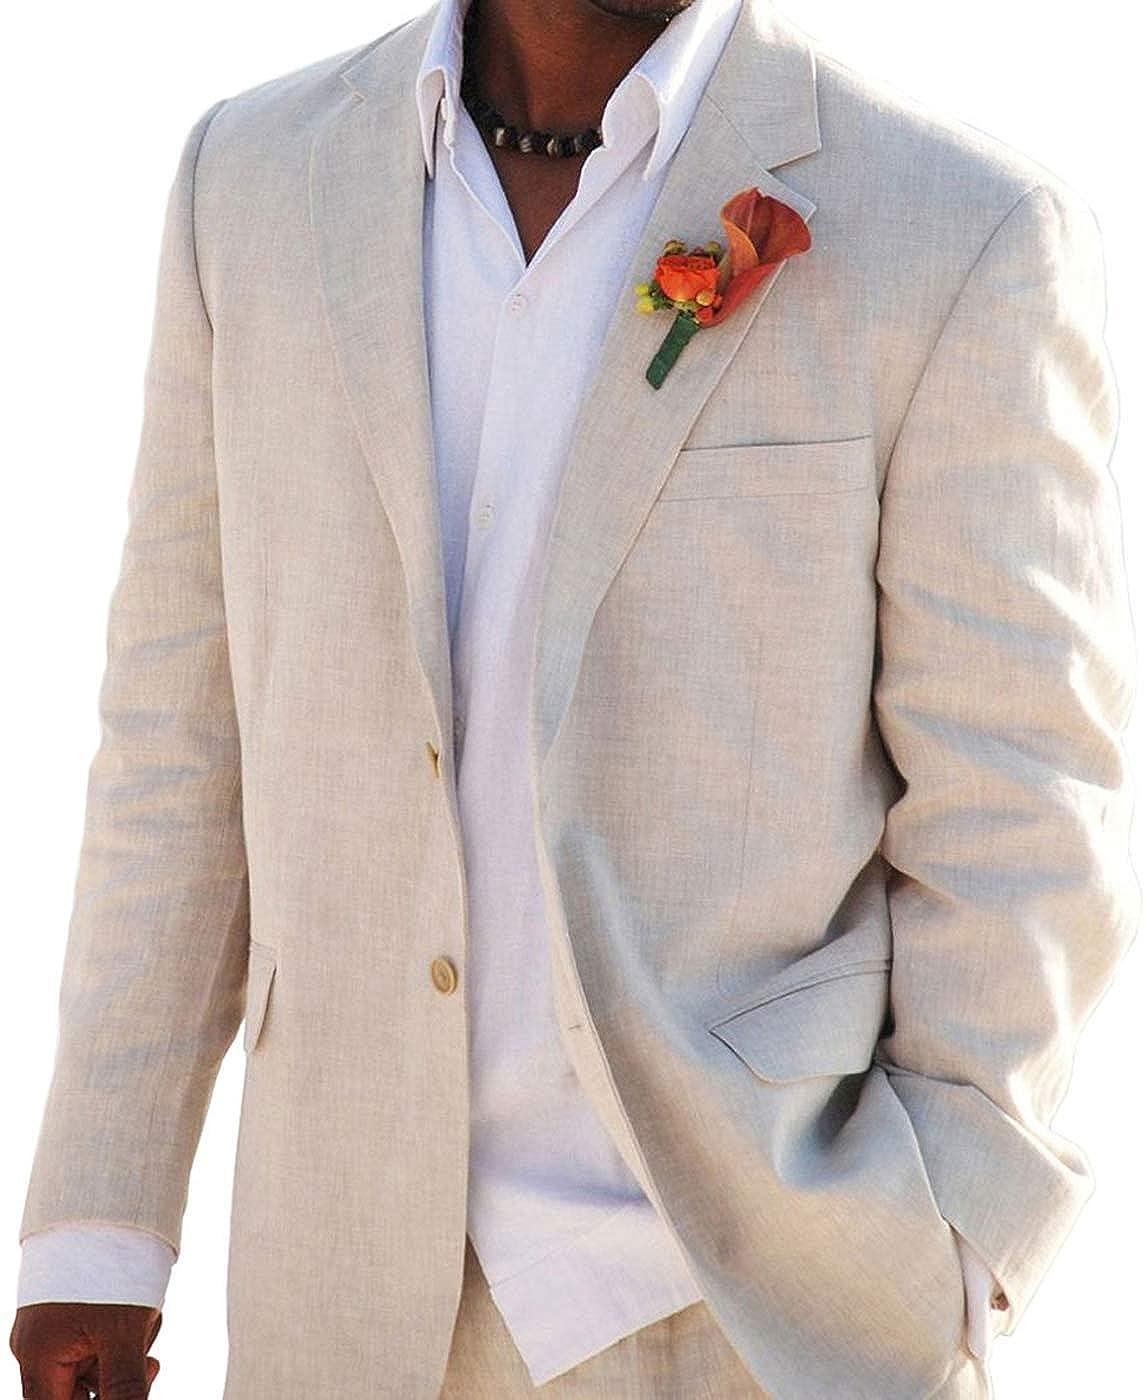 Aokaixi Mens Suit 2 Button Beach Wedding Tuxedos for Men Grooms Jacket Pants